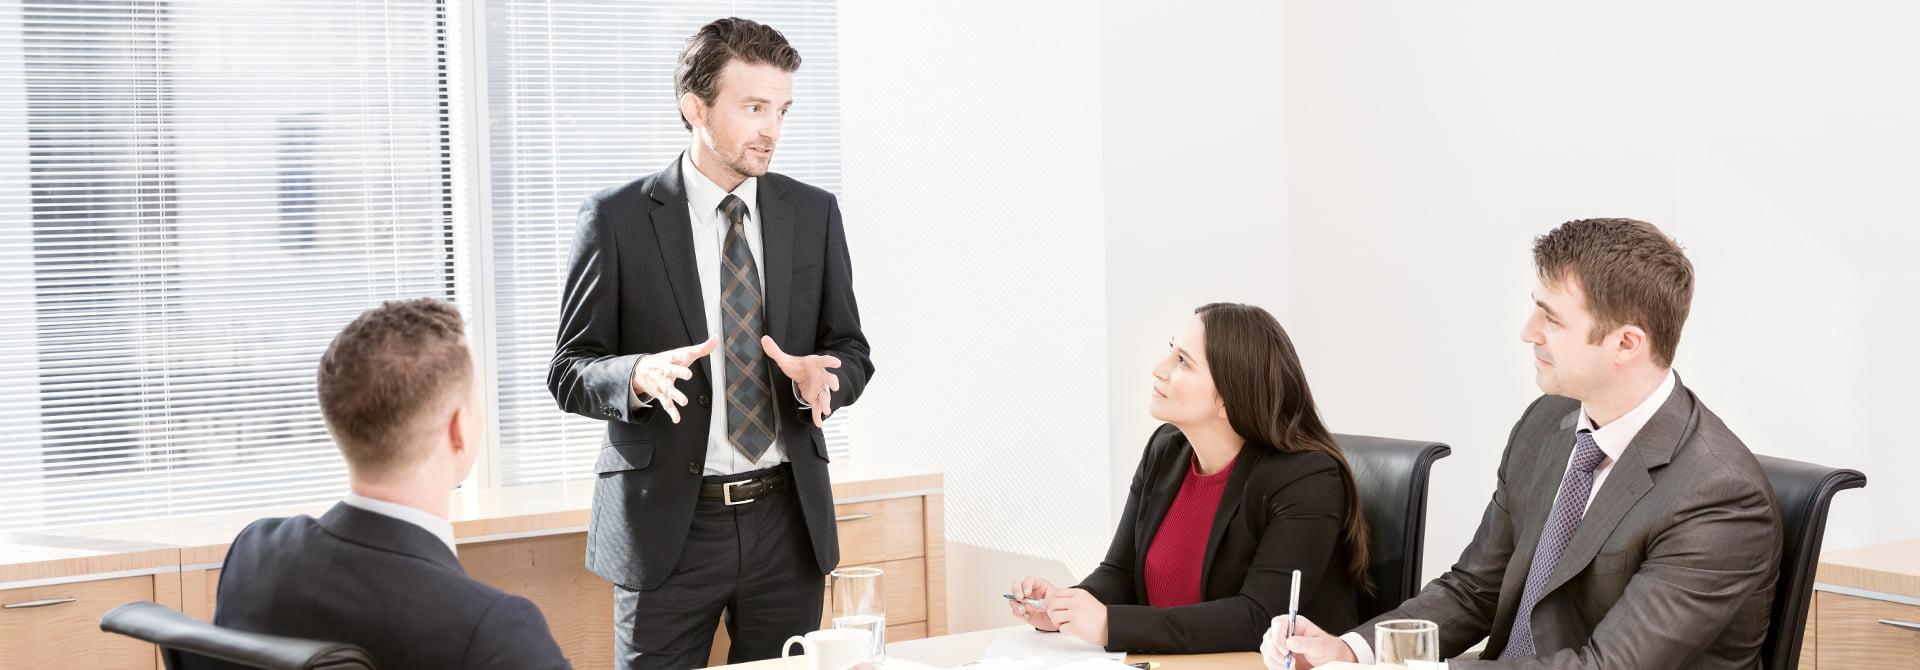 employment law student jobs